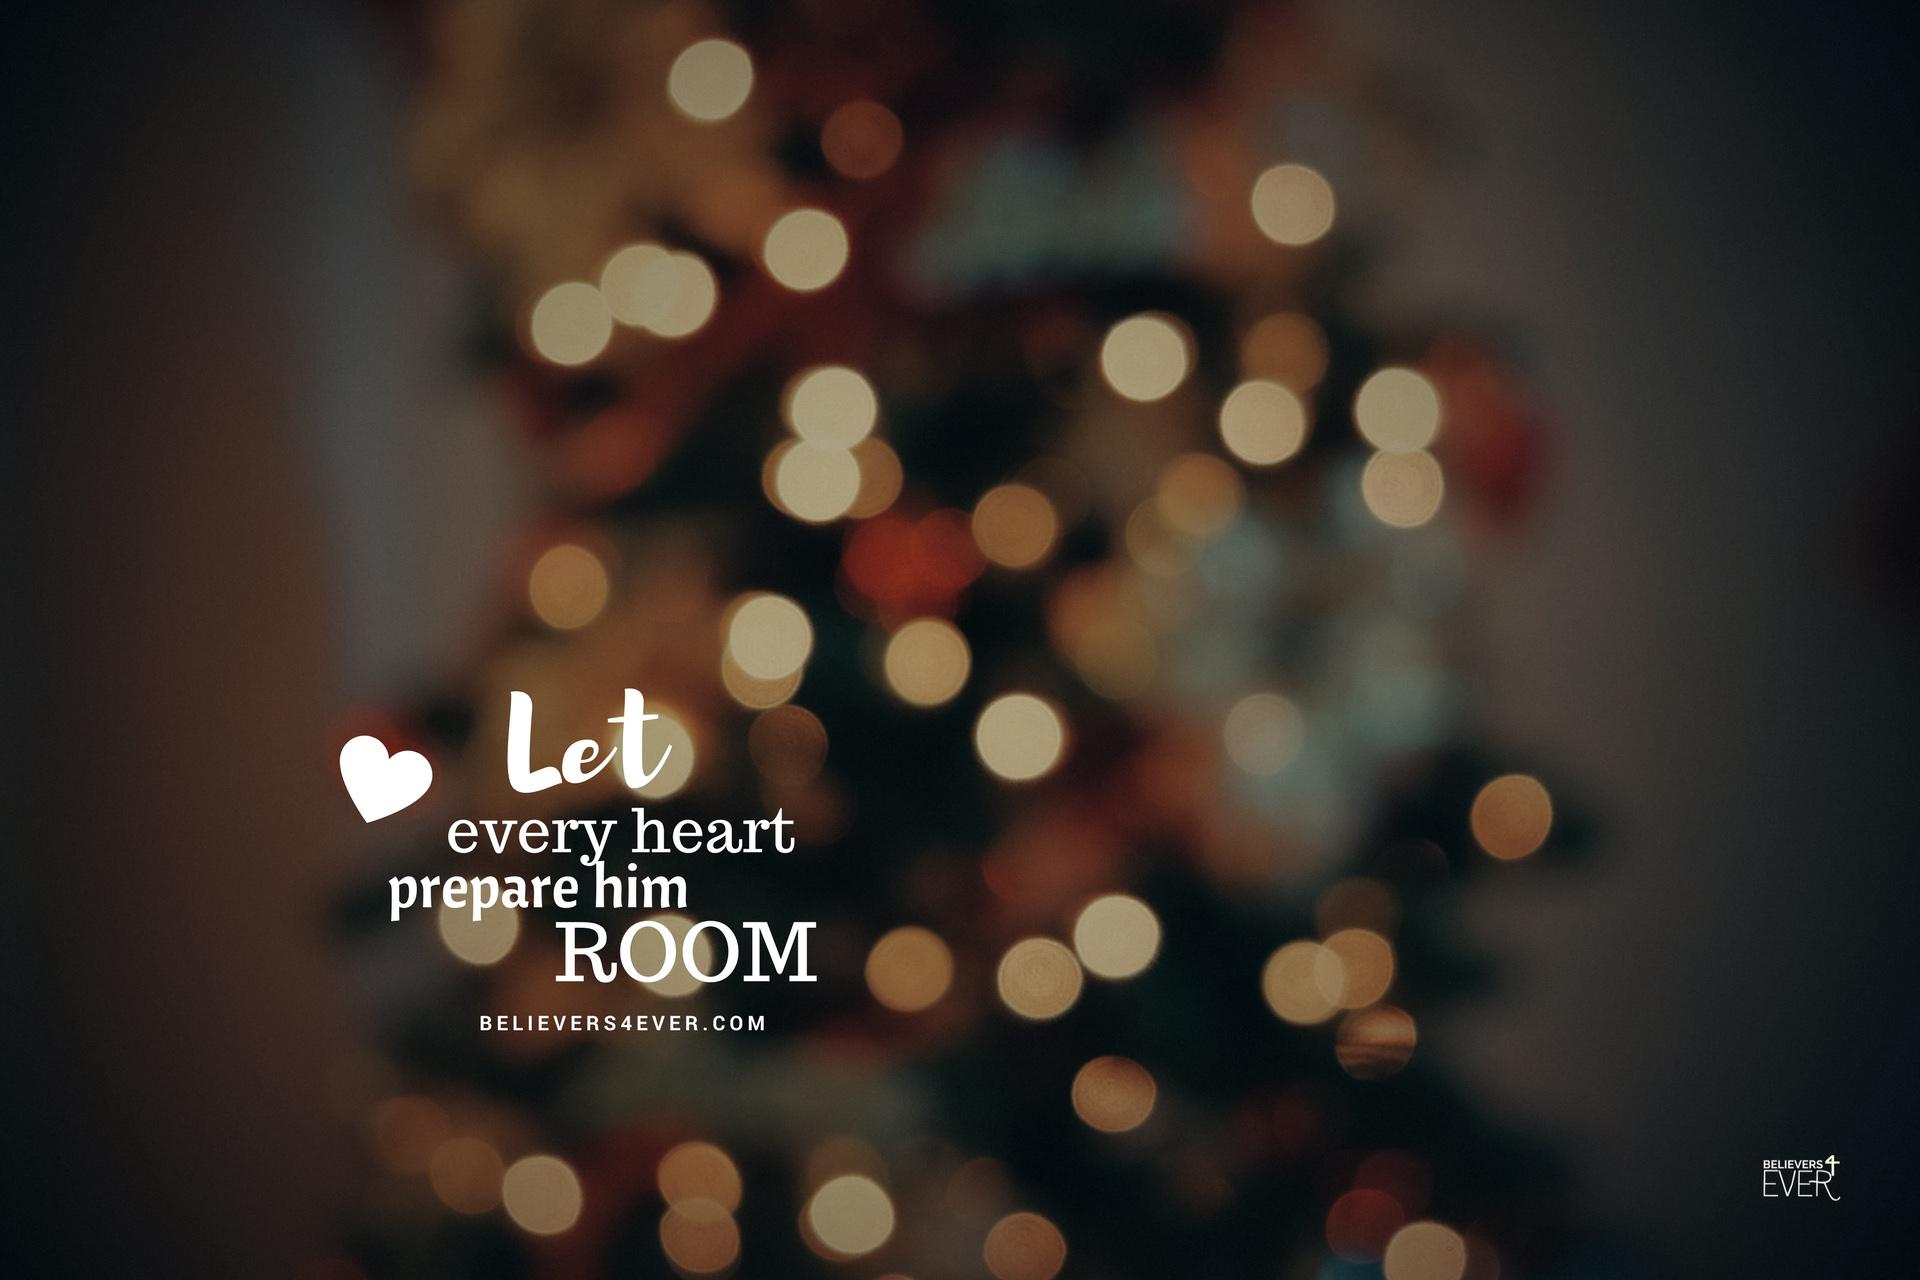 152 1526577 let every heart prepare him room jesus wallpaper